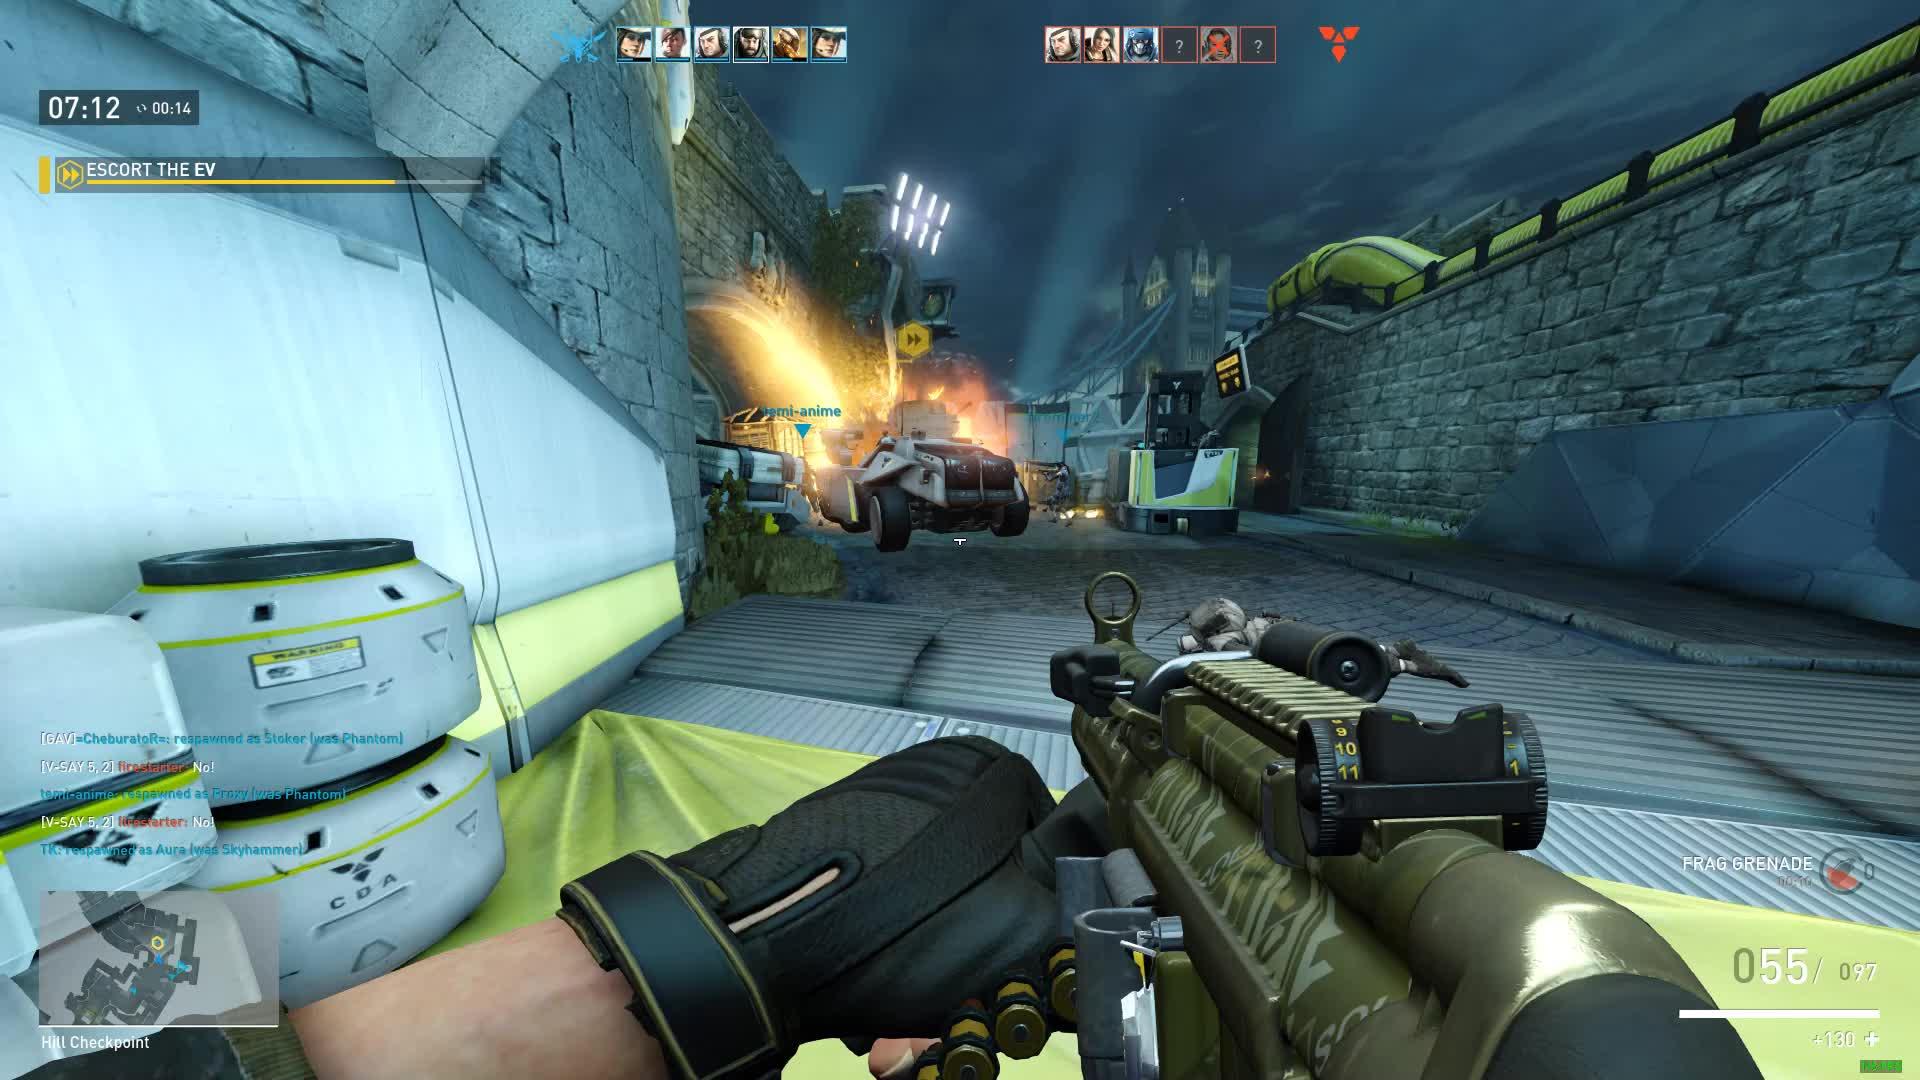 dirtybomb, dirtybomb shadowplay highlight nade1 GIFs